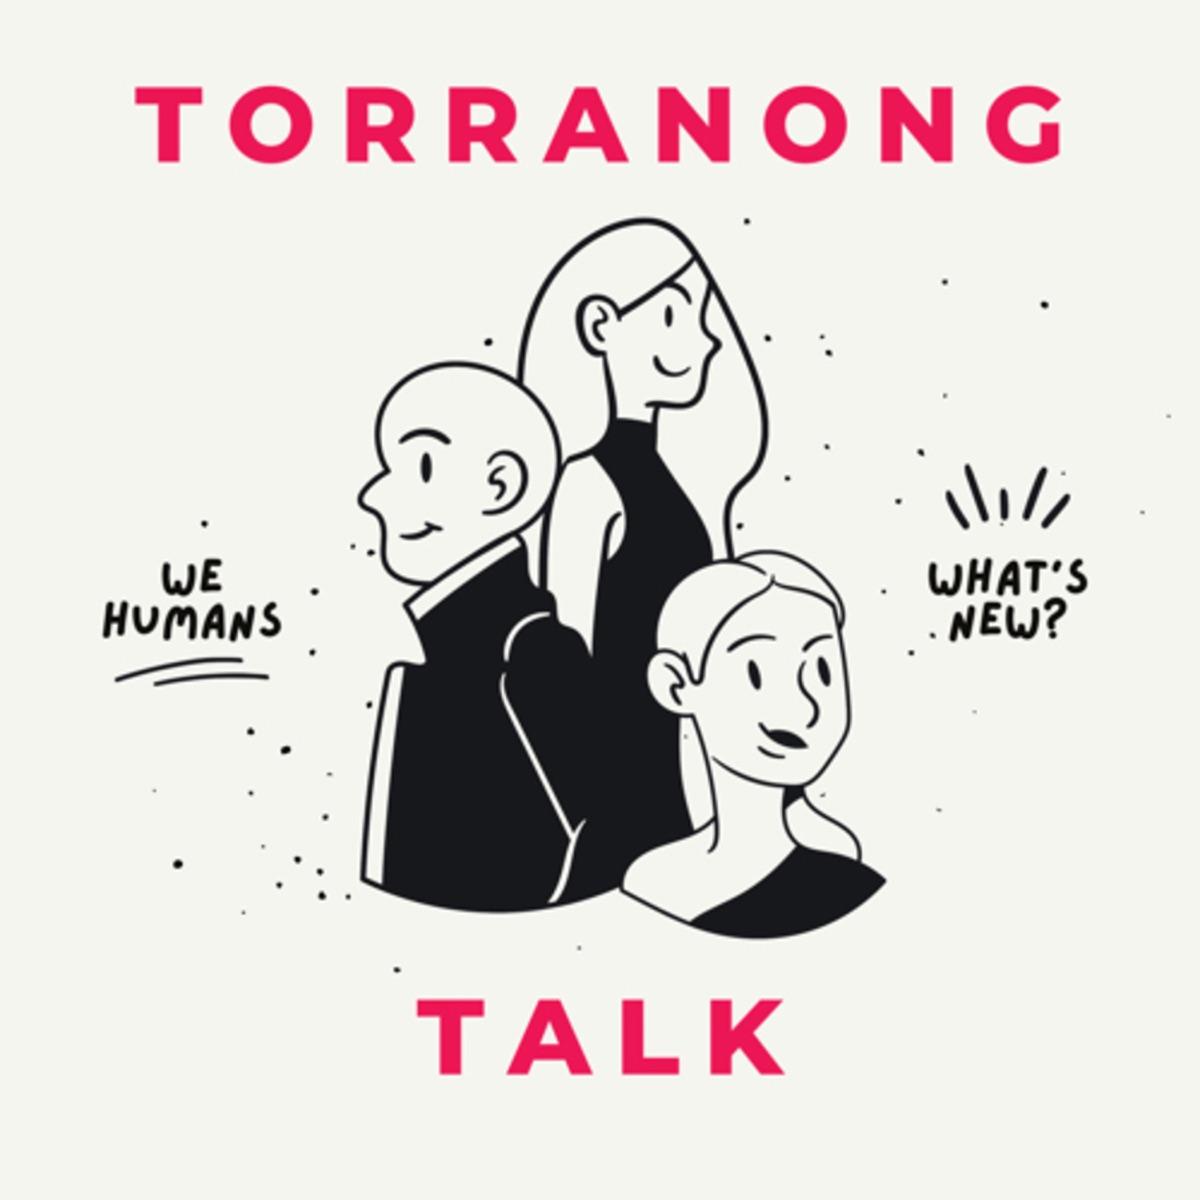 Torranong Talk